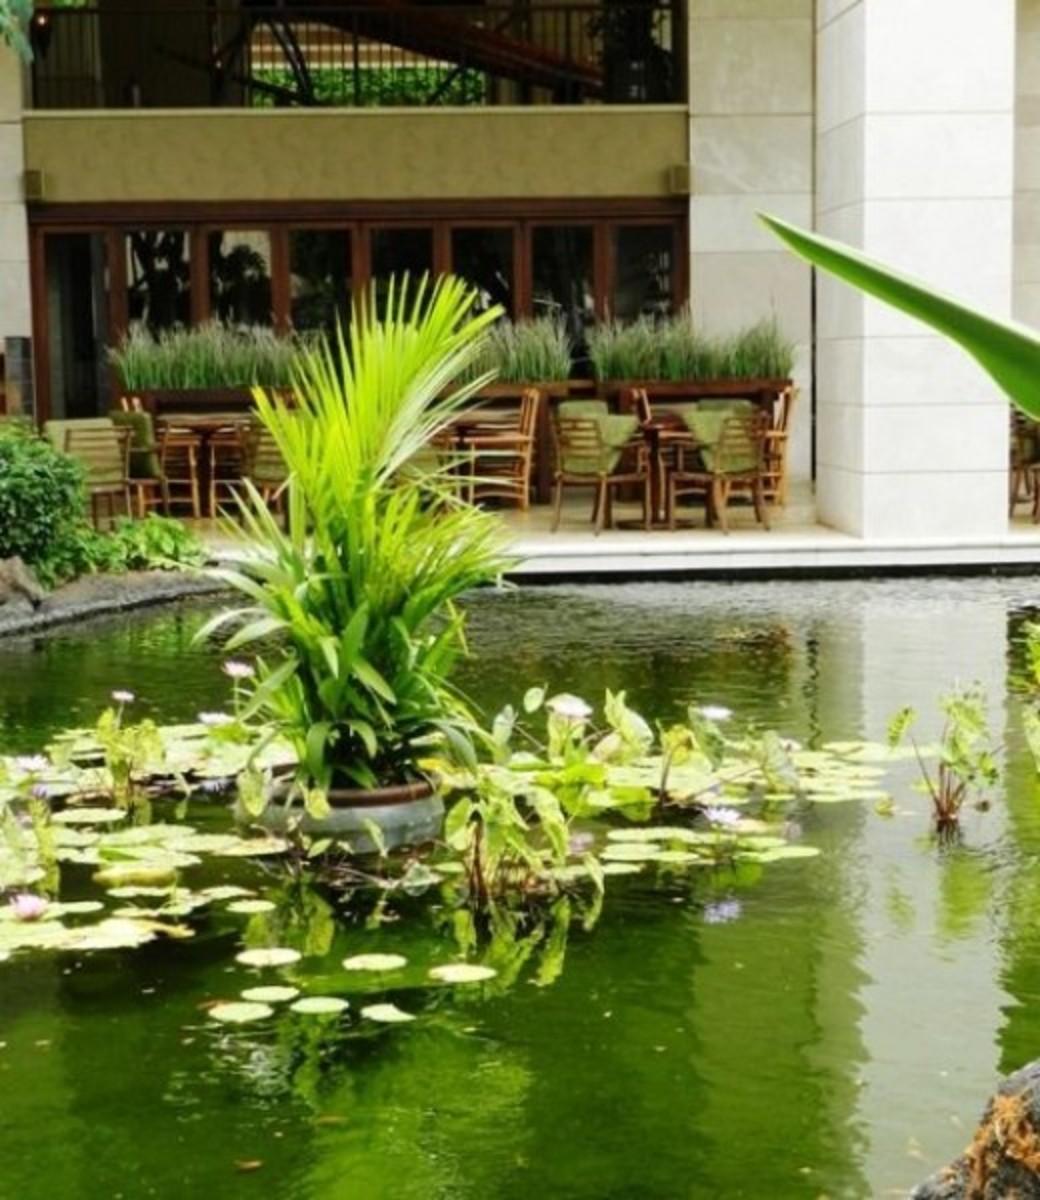 Koi pond and restaurant